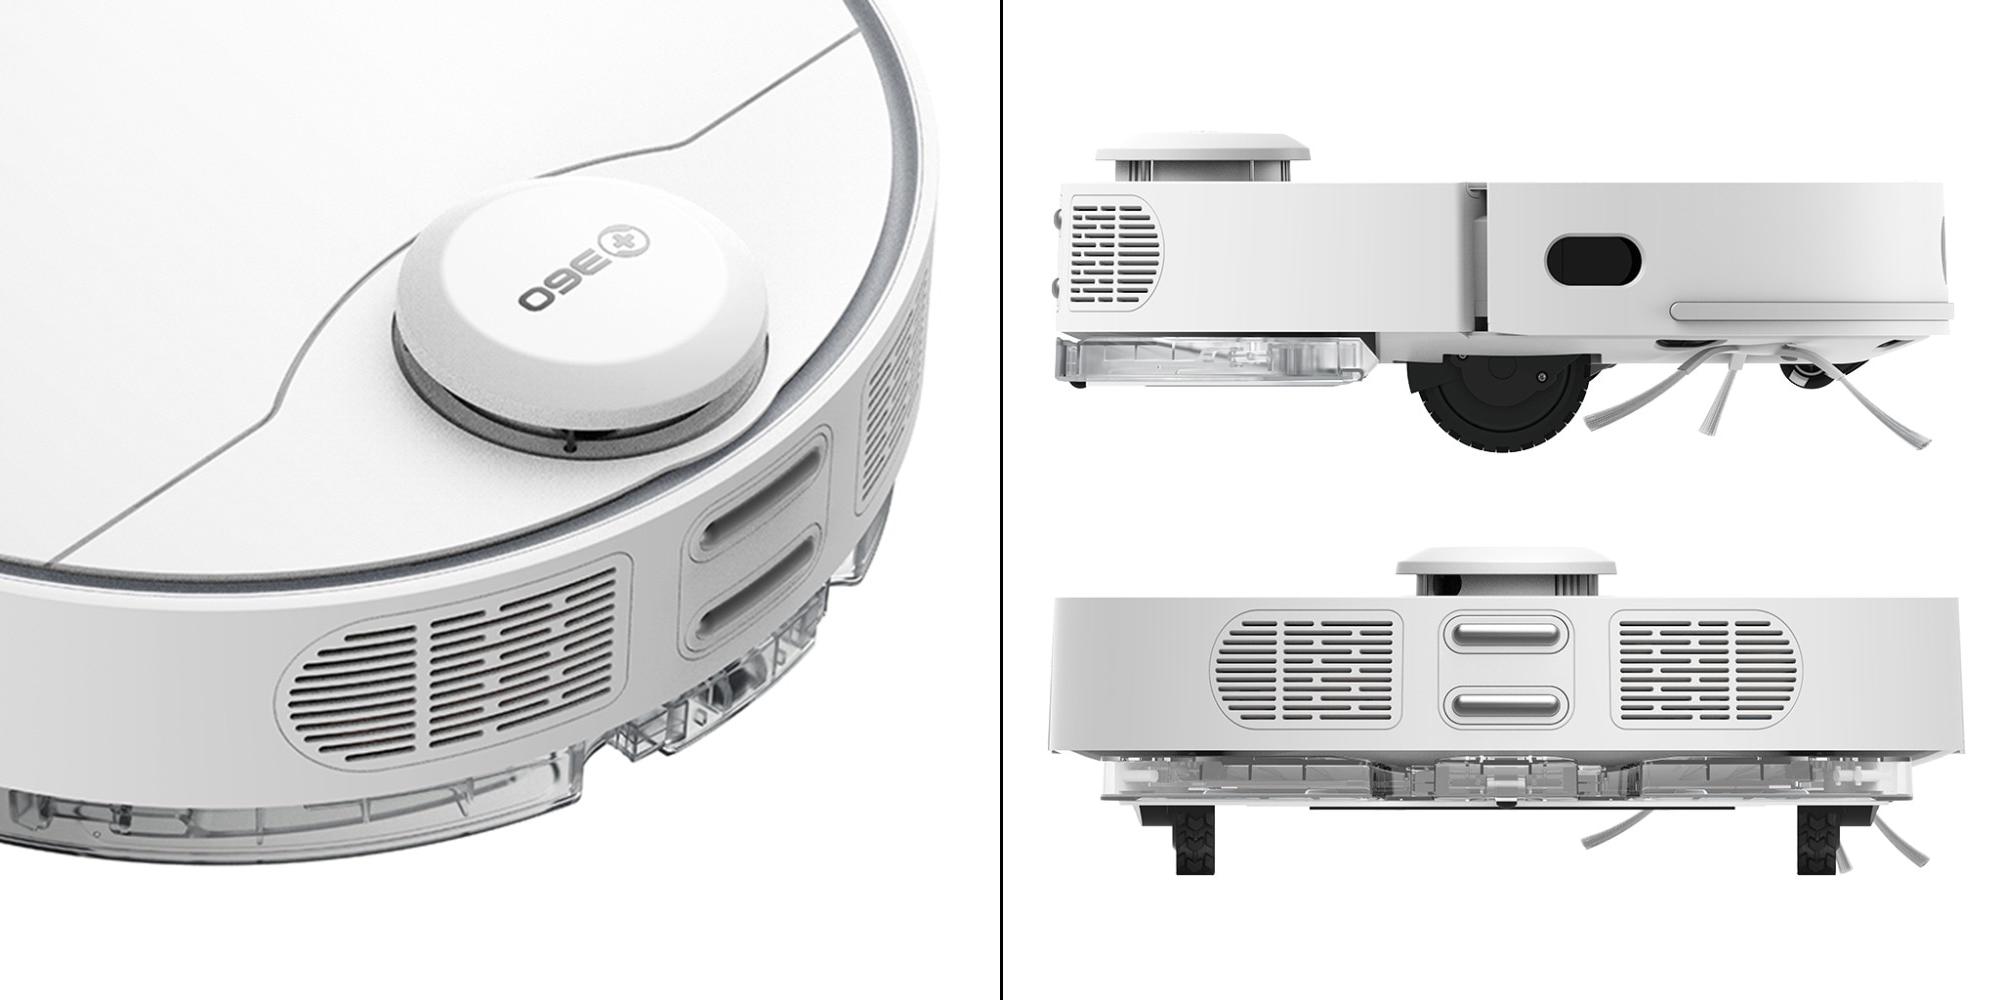 360 robot vacuum cleaner s9 - отзывы